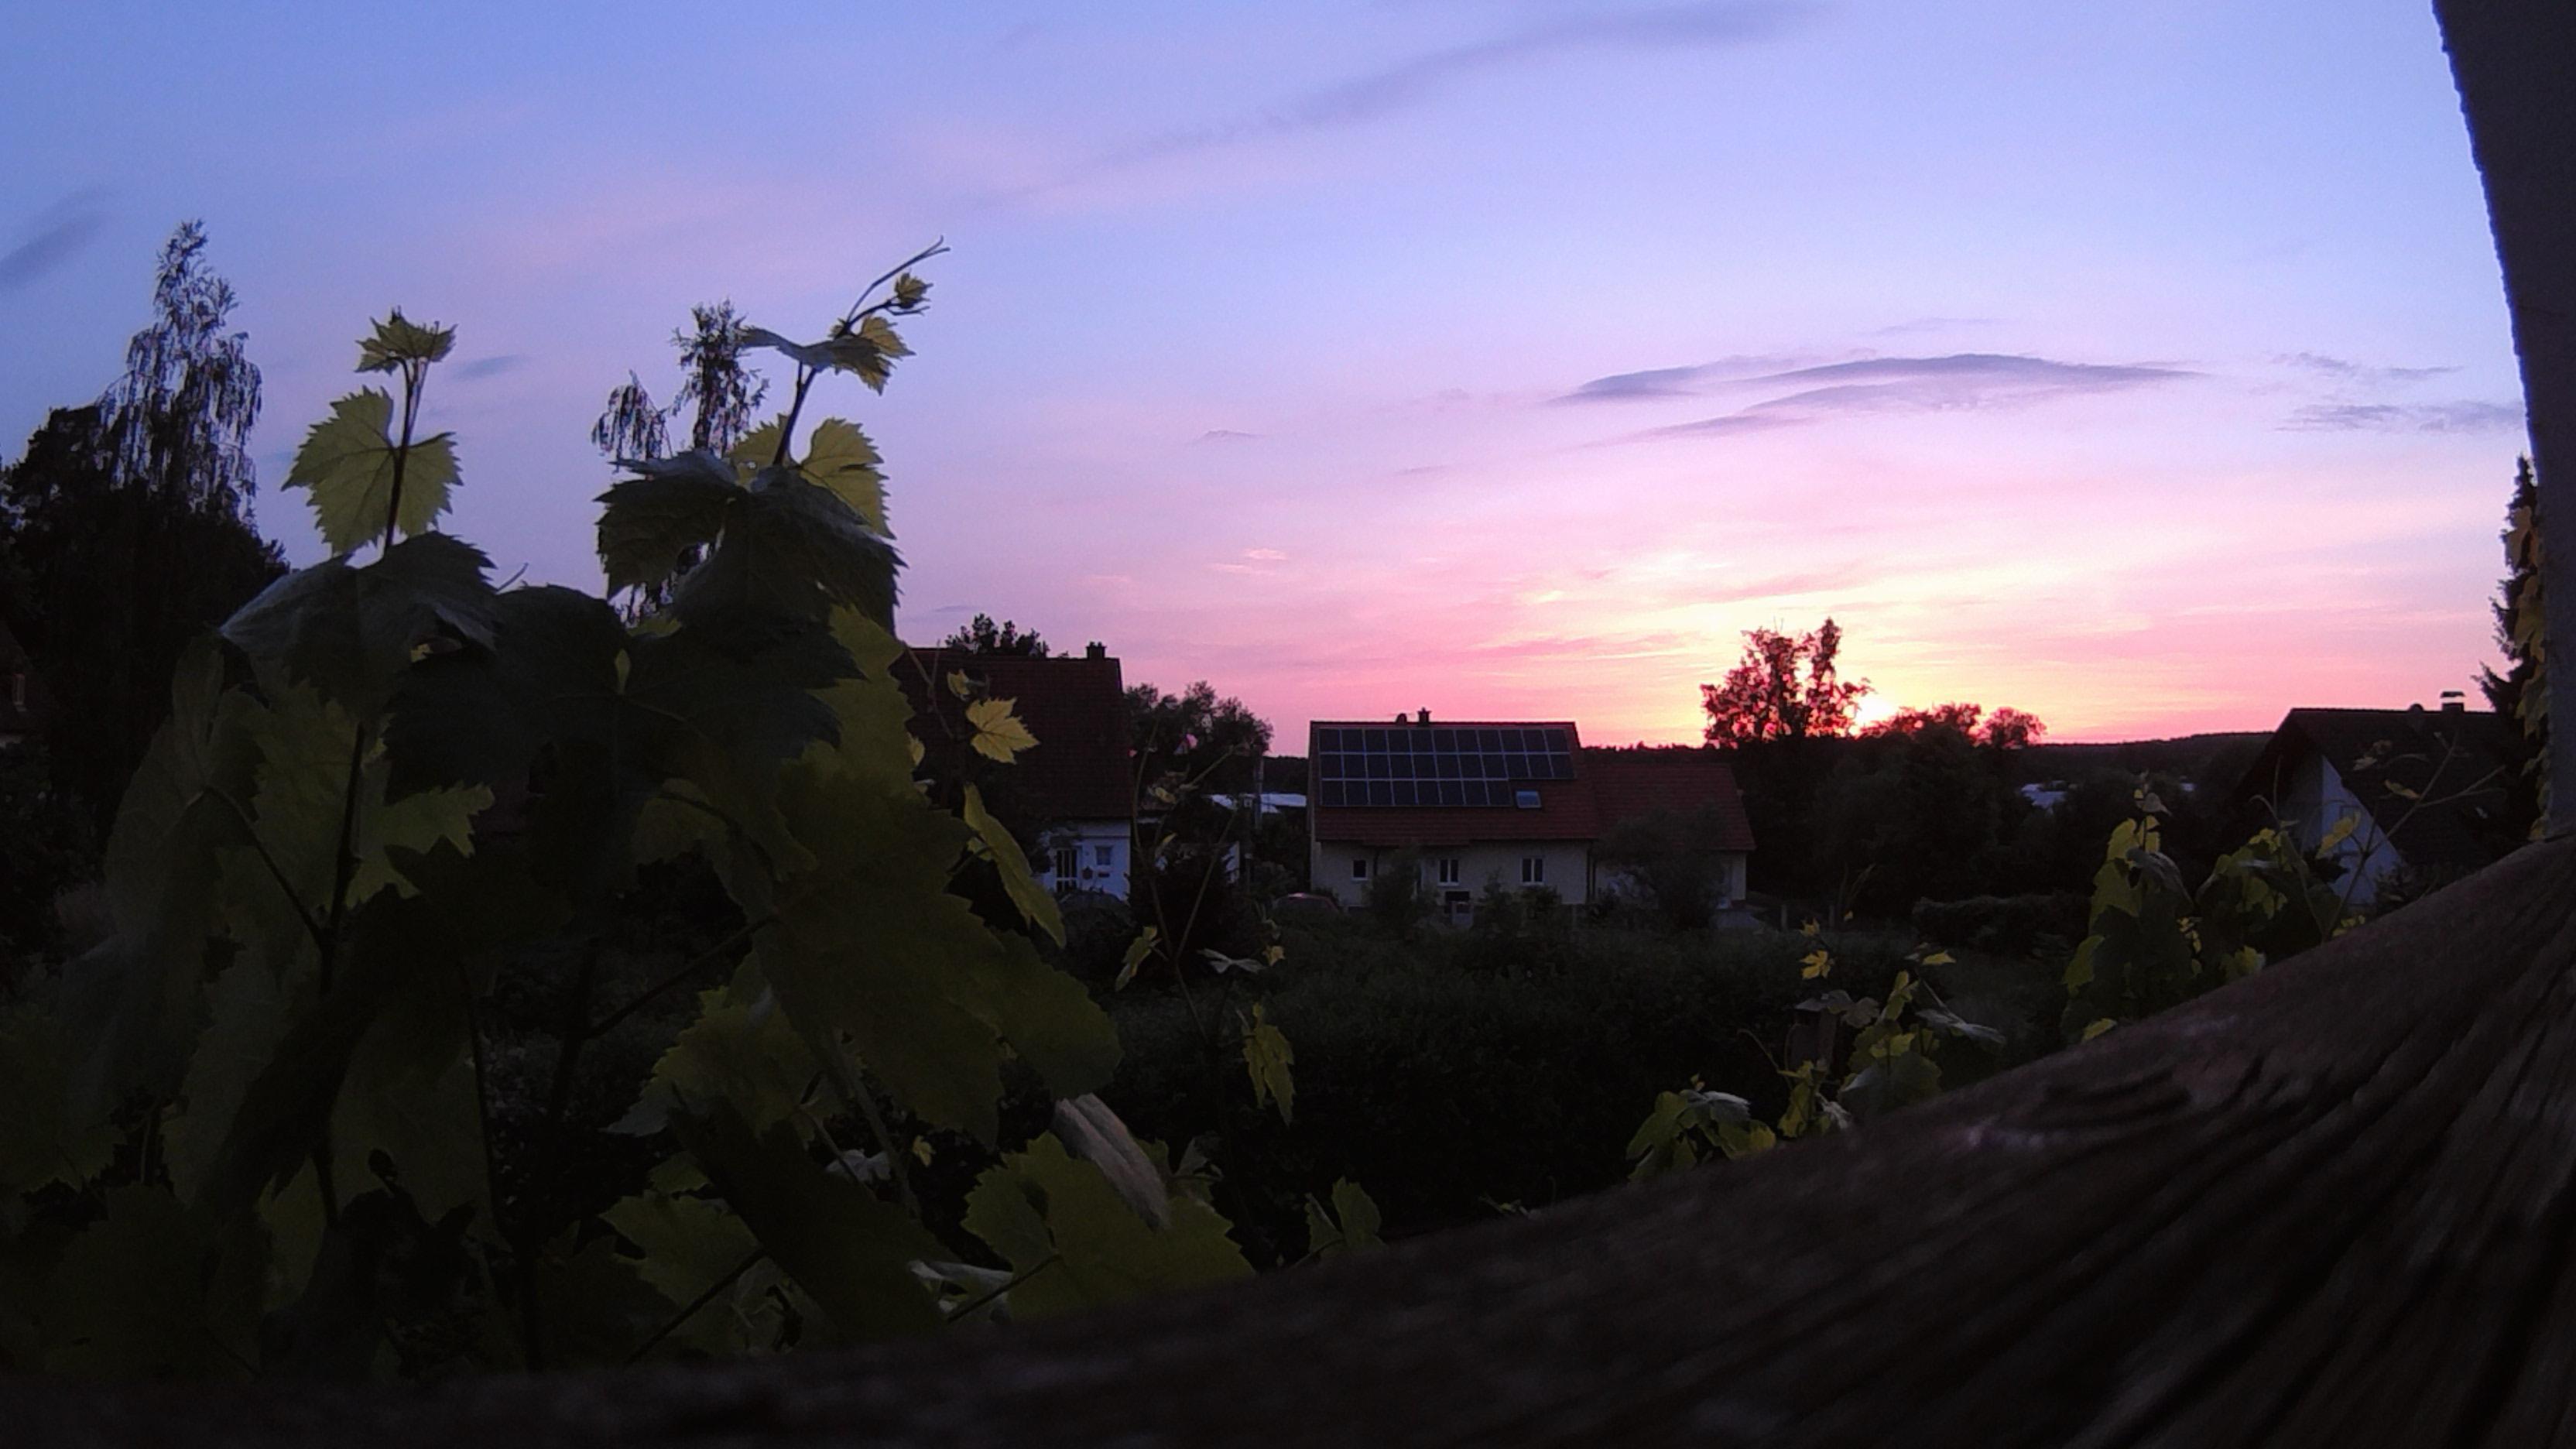 Polaroid CUBE - Abendsonne